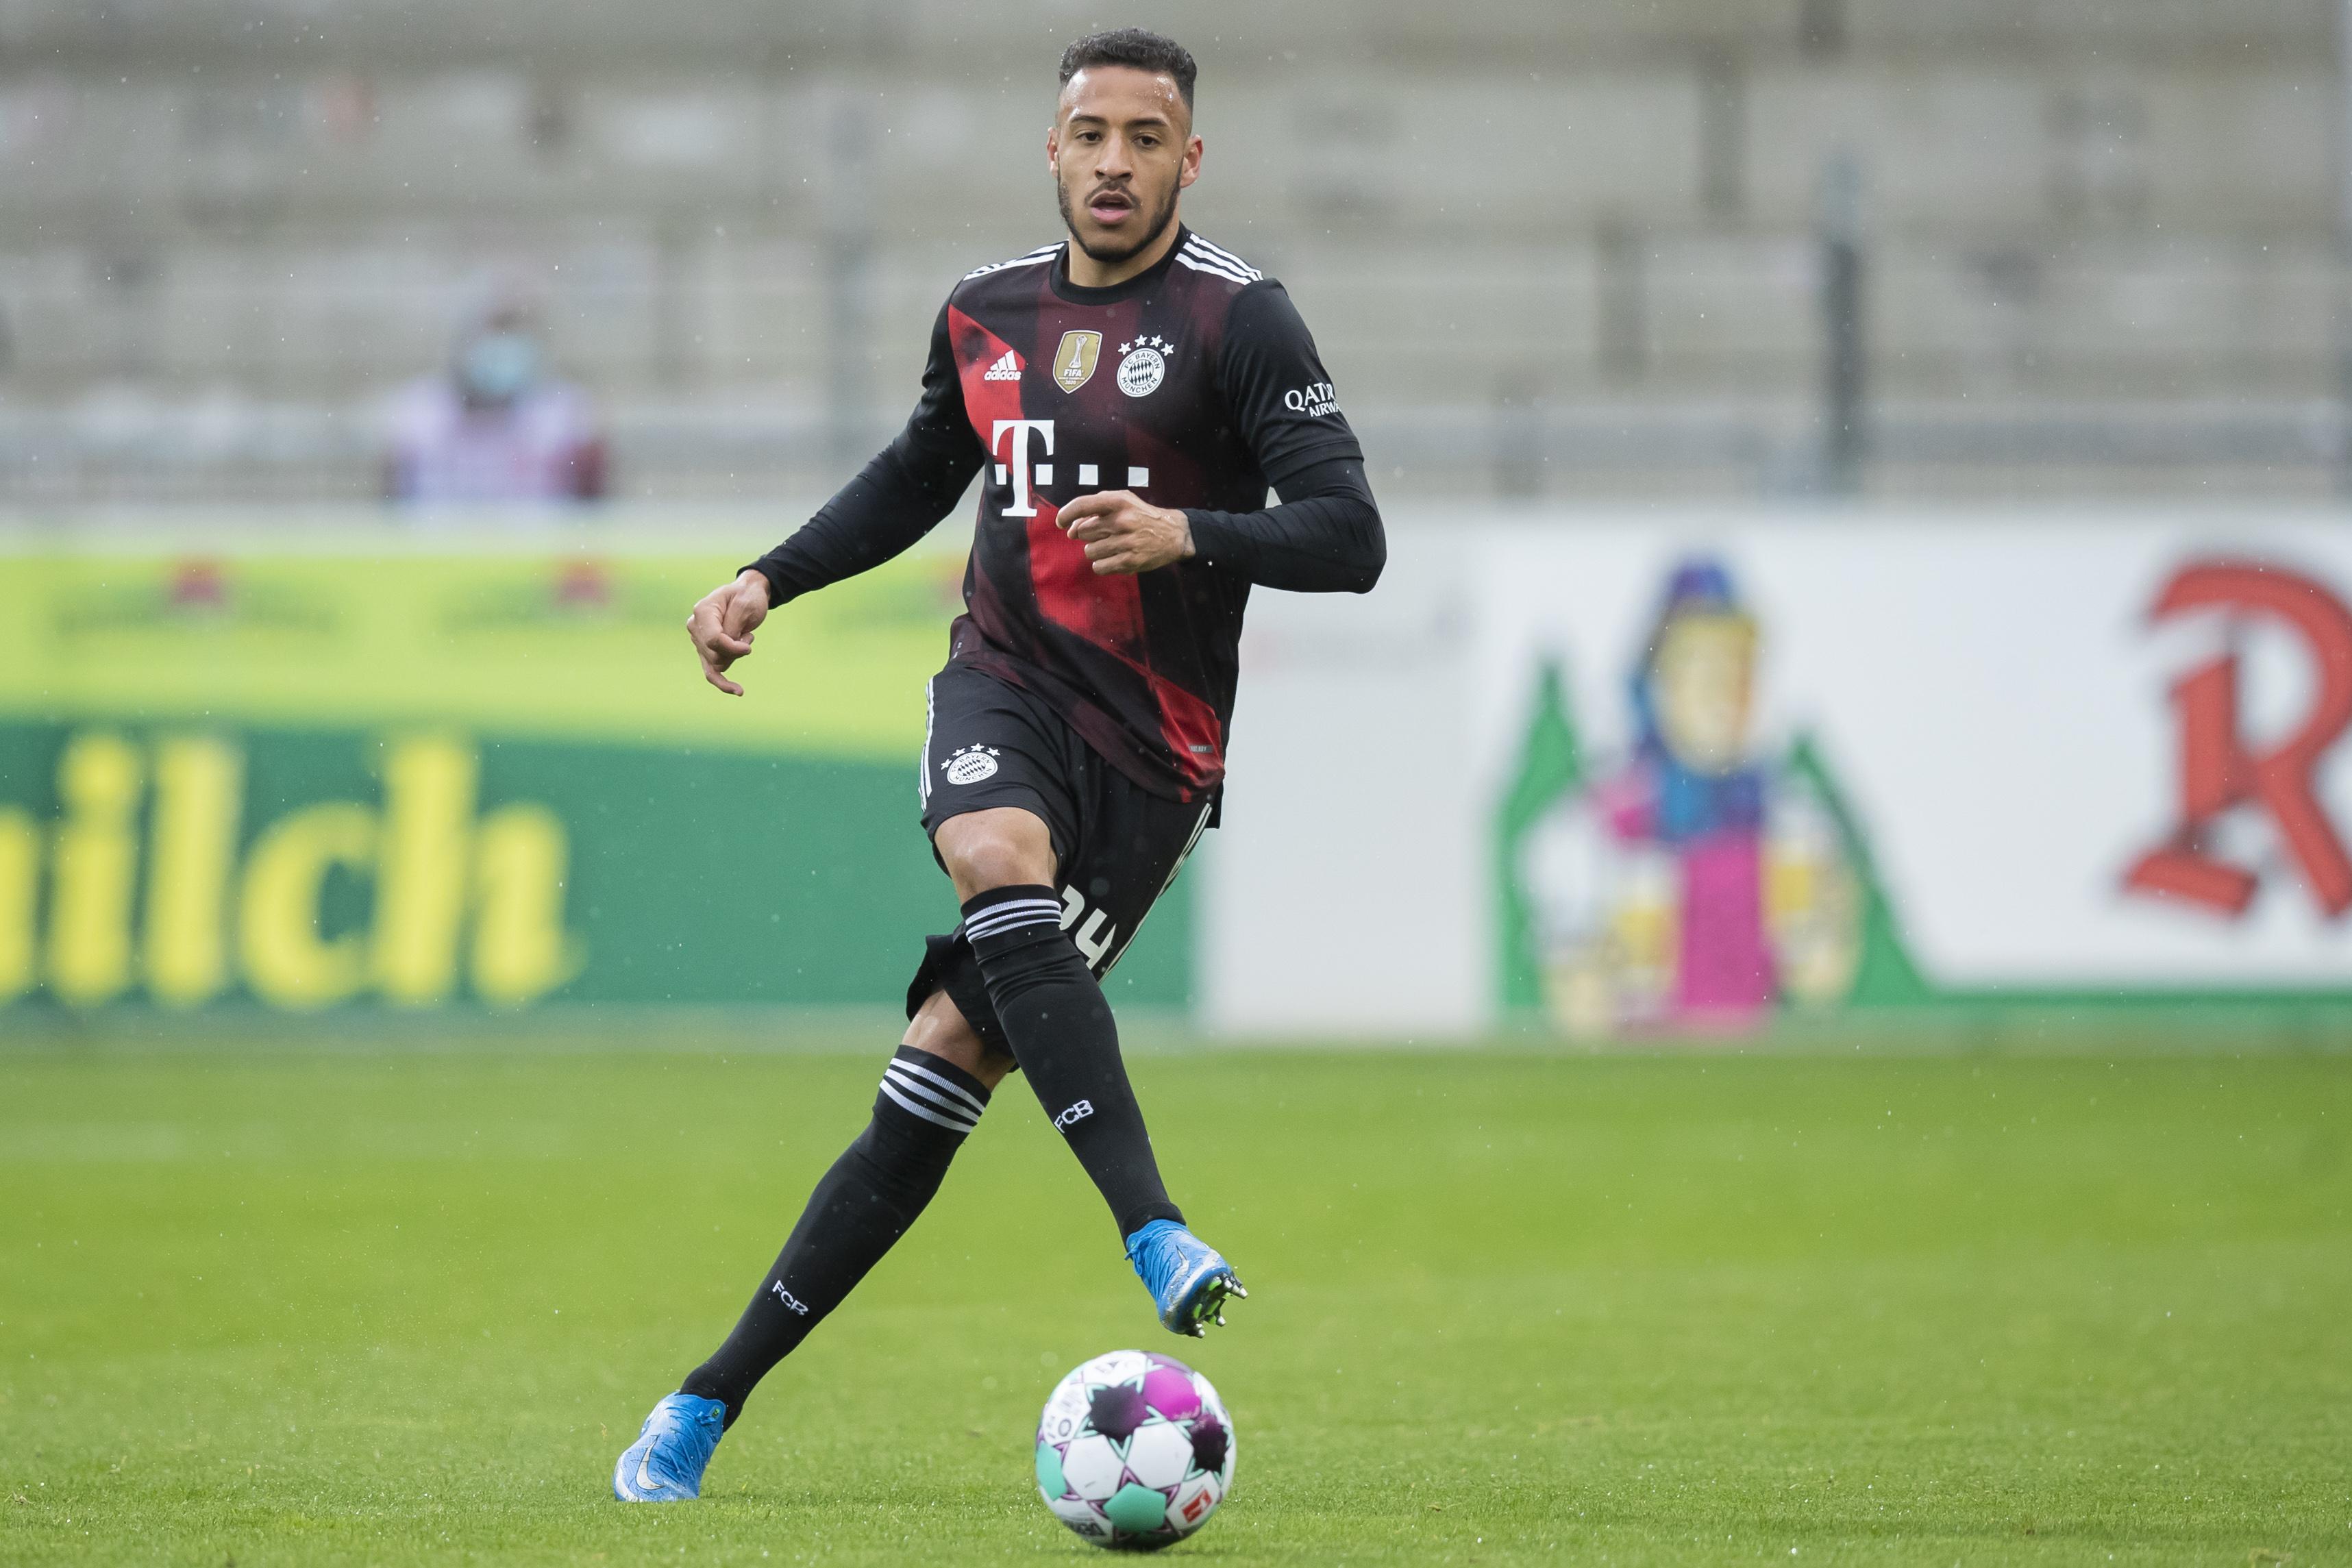 SC Freiburg - Bayern Munich